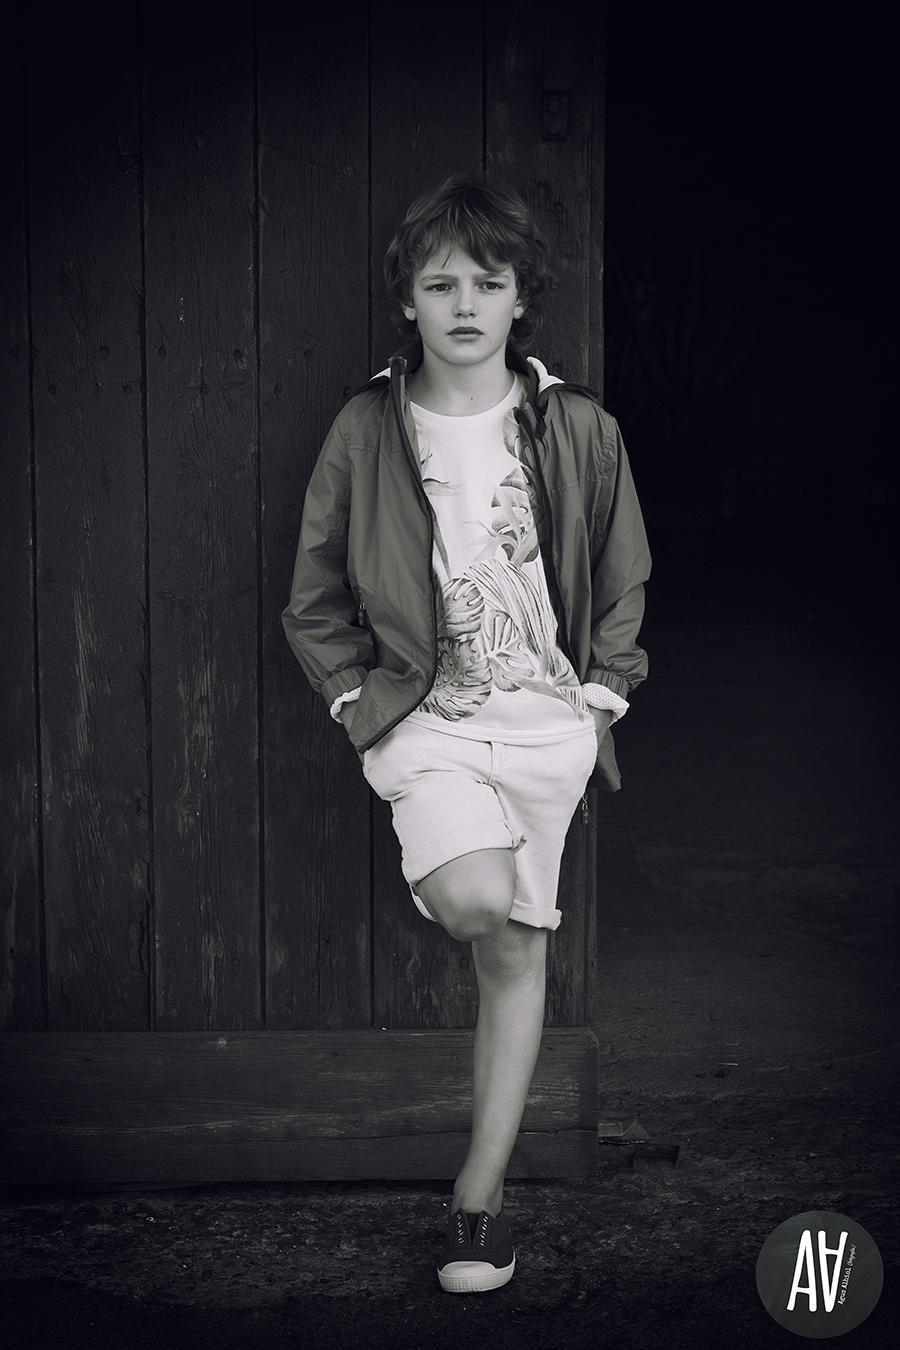 editorial petit style moda niños fotografa de moda vontage farmers salvador models fotografa barcelona.8